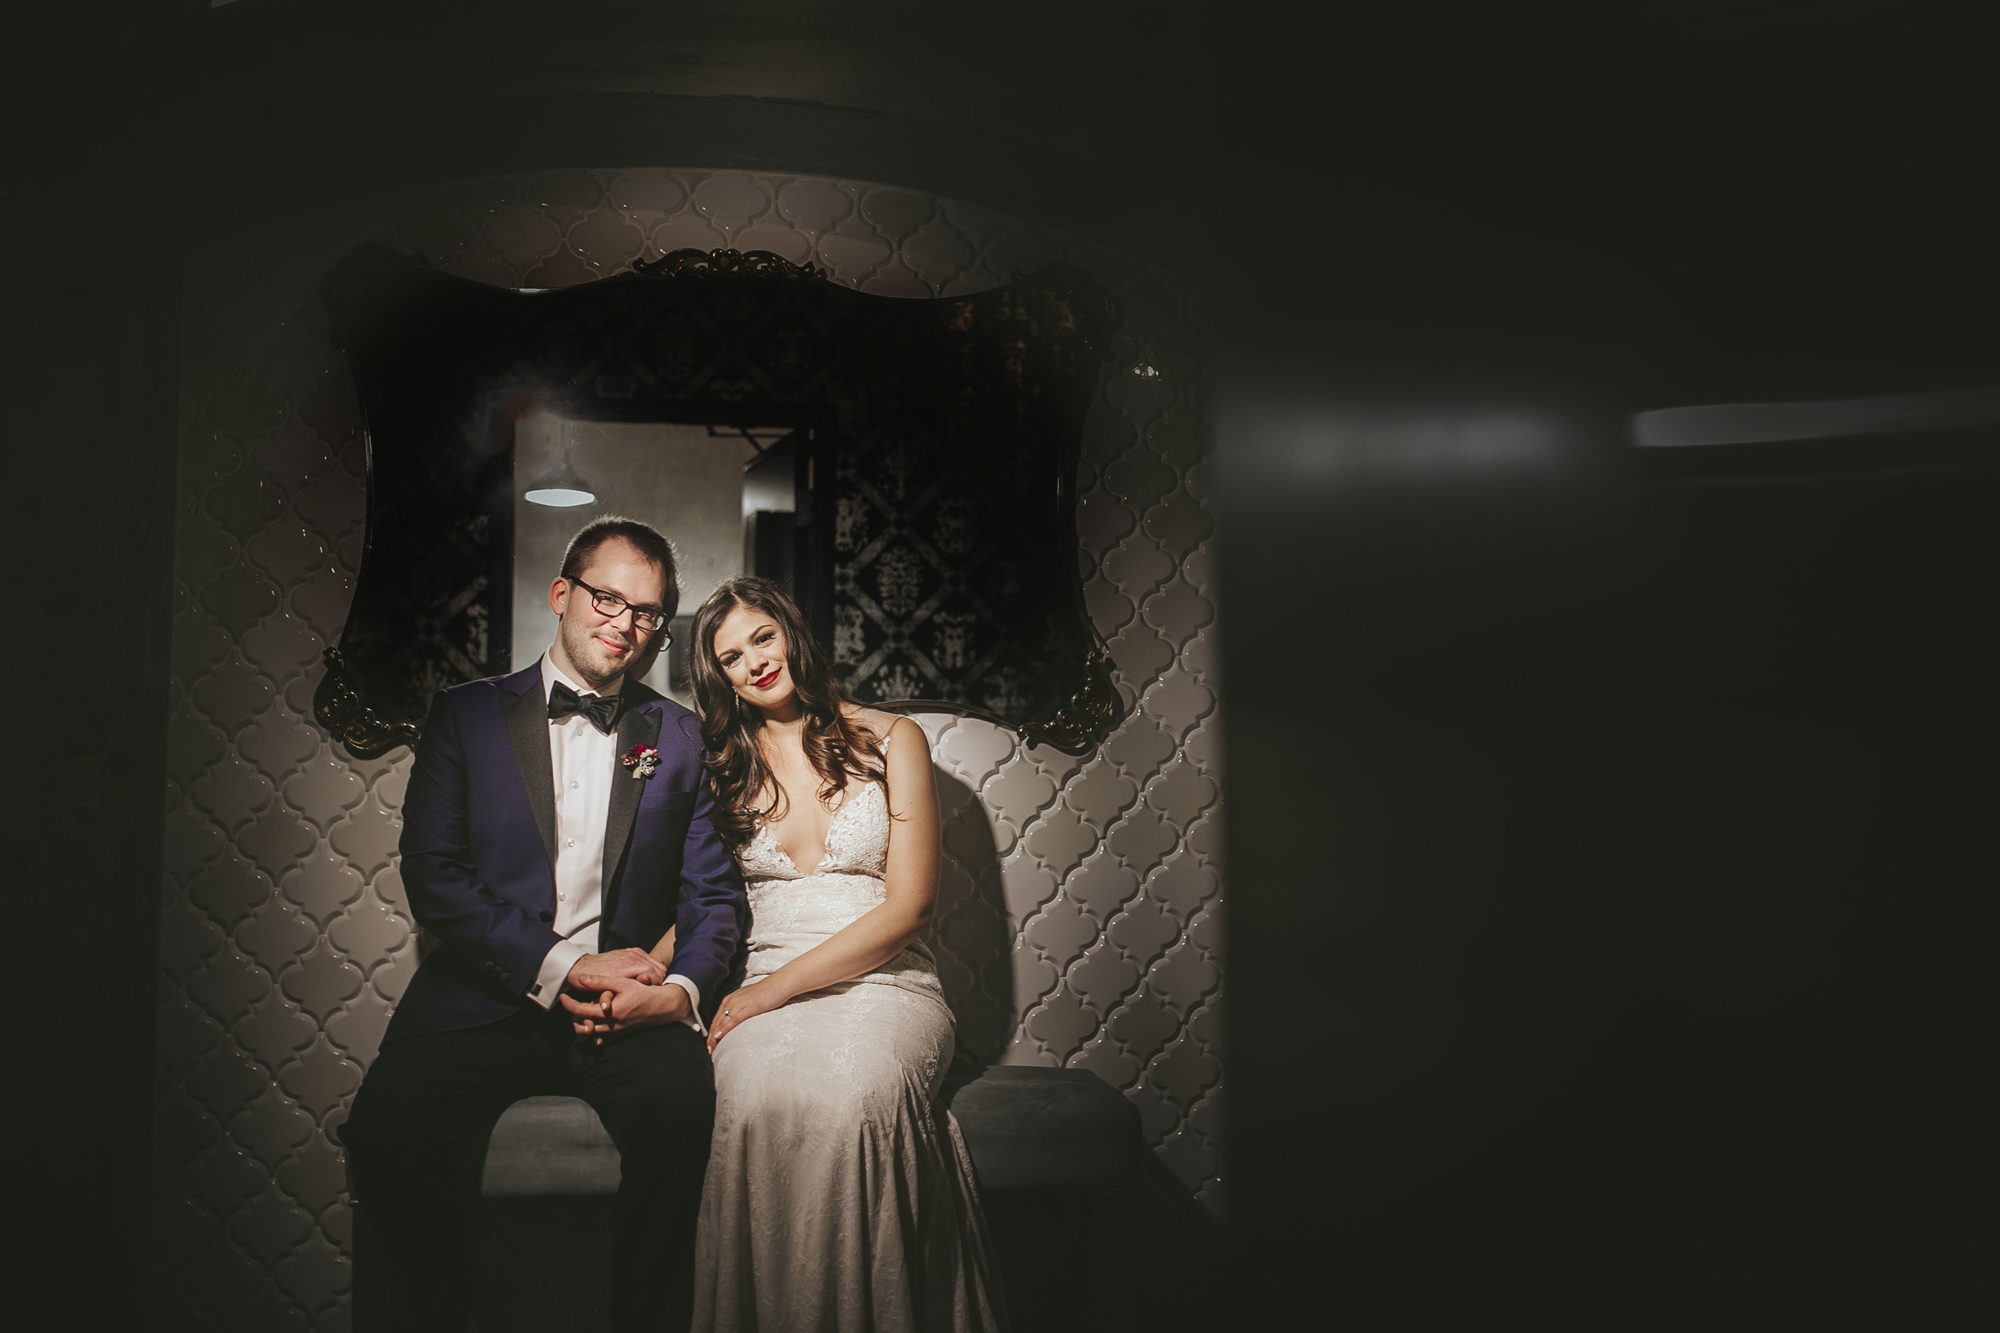 Brandon werth minnesota wedding photographer aria minneapolis